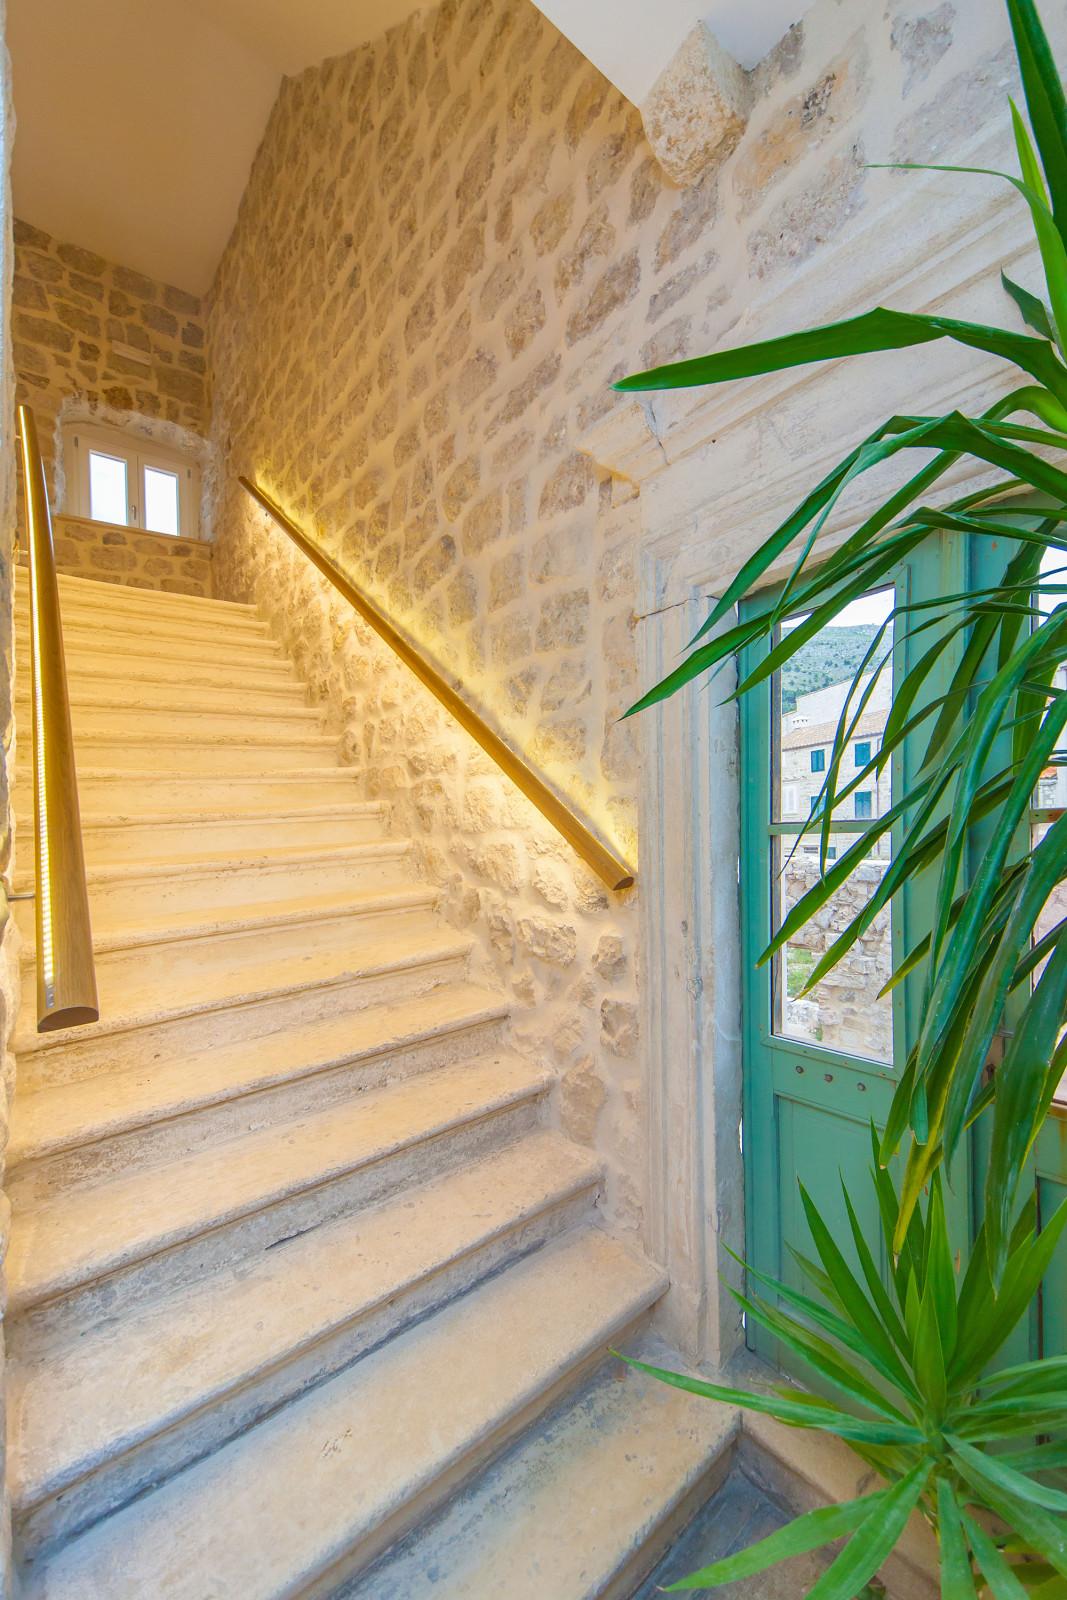 Lausion Dubrovnik 7.jpg